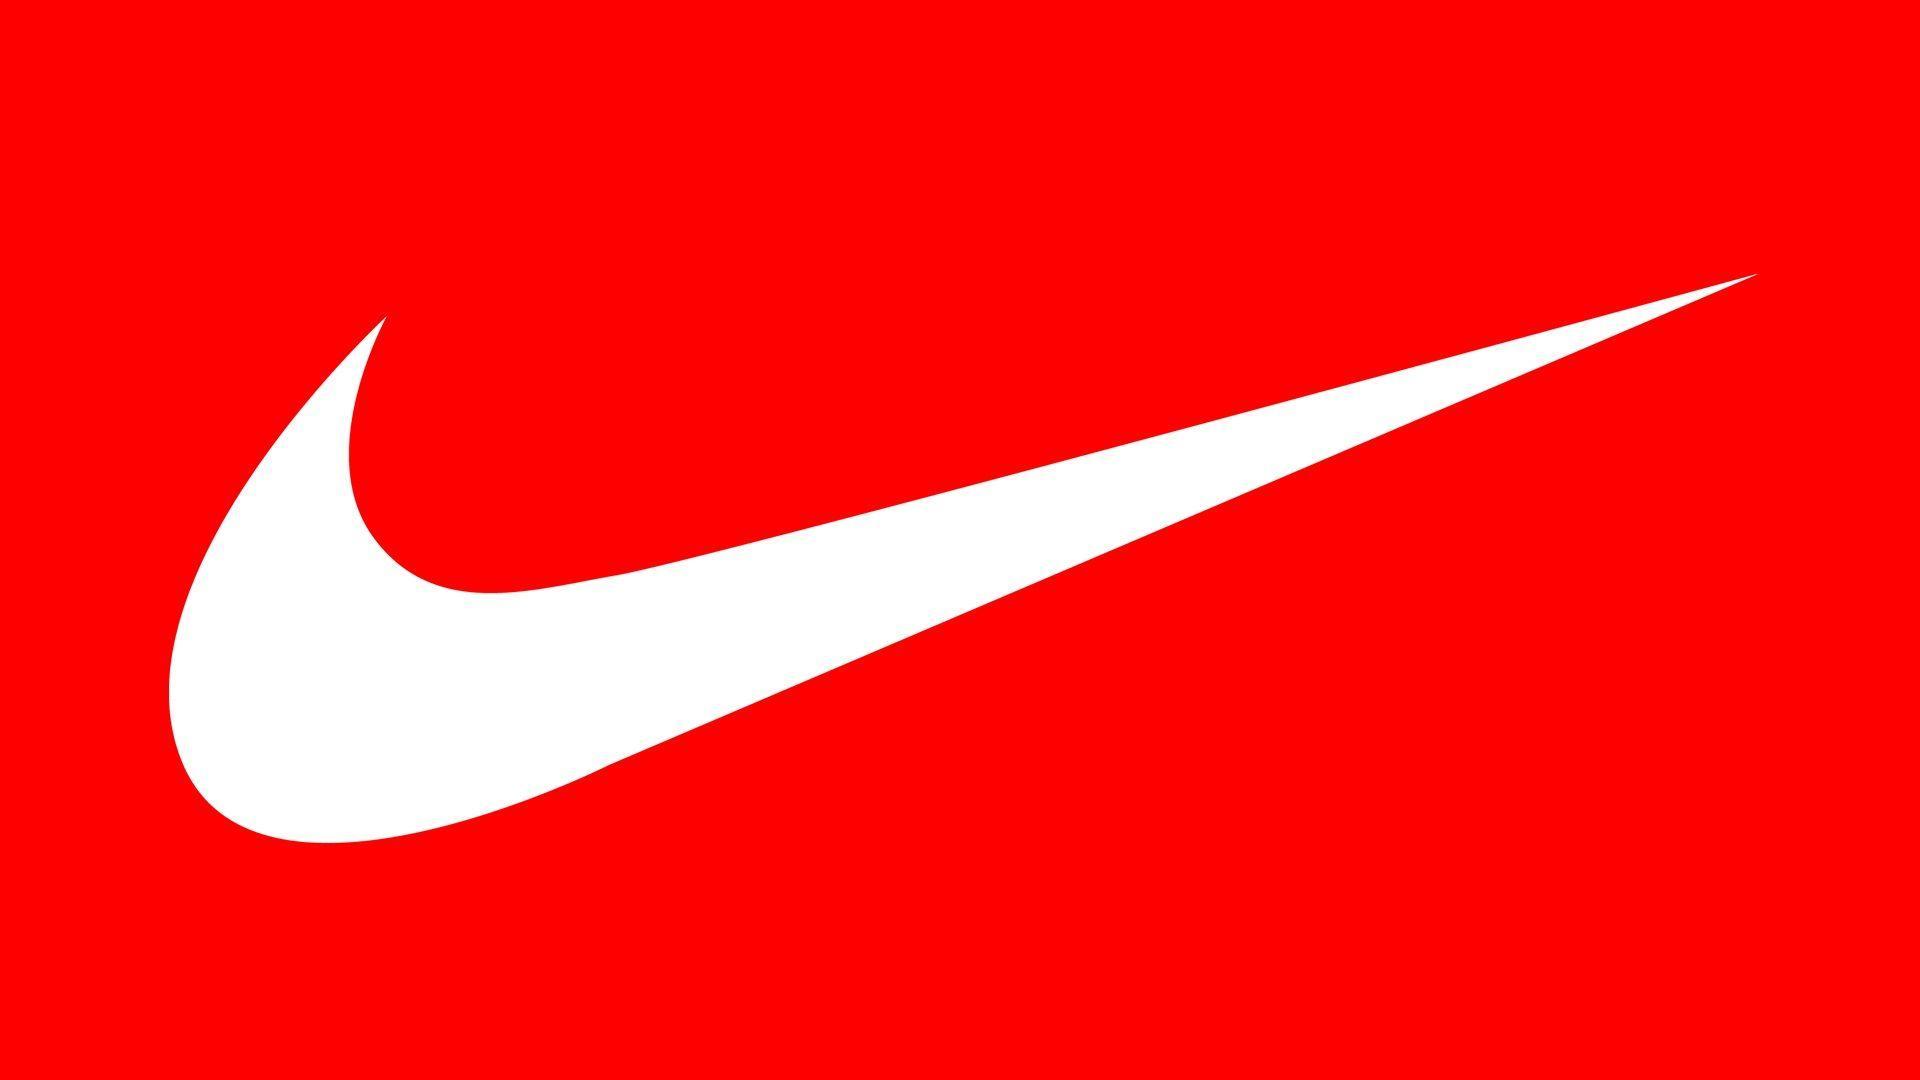 Wallpapers For > Nike Wallpaper